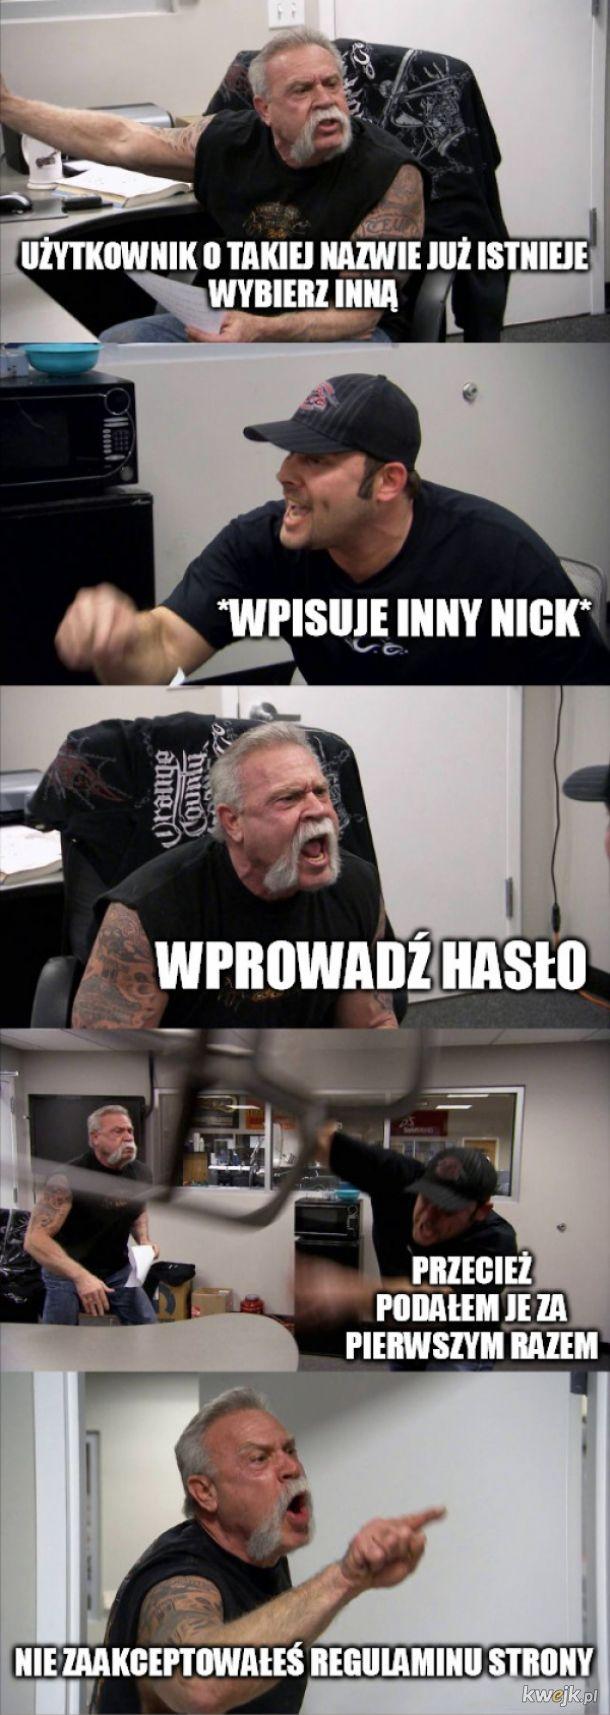 Inny nick